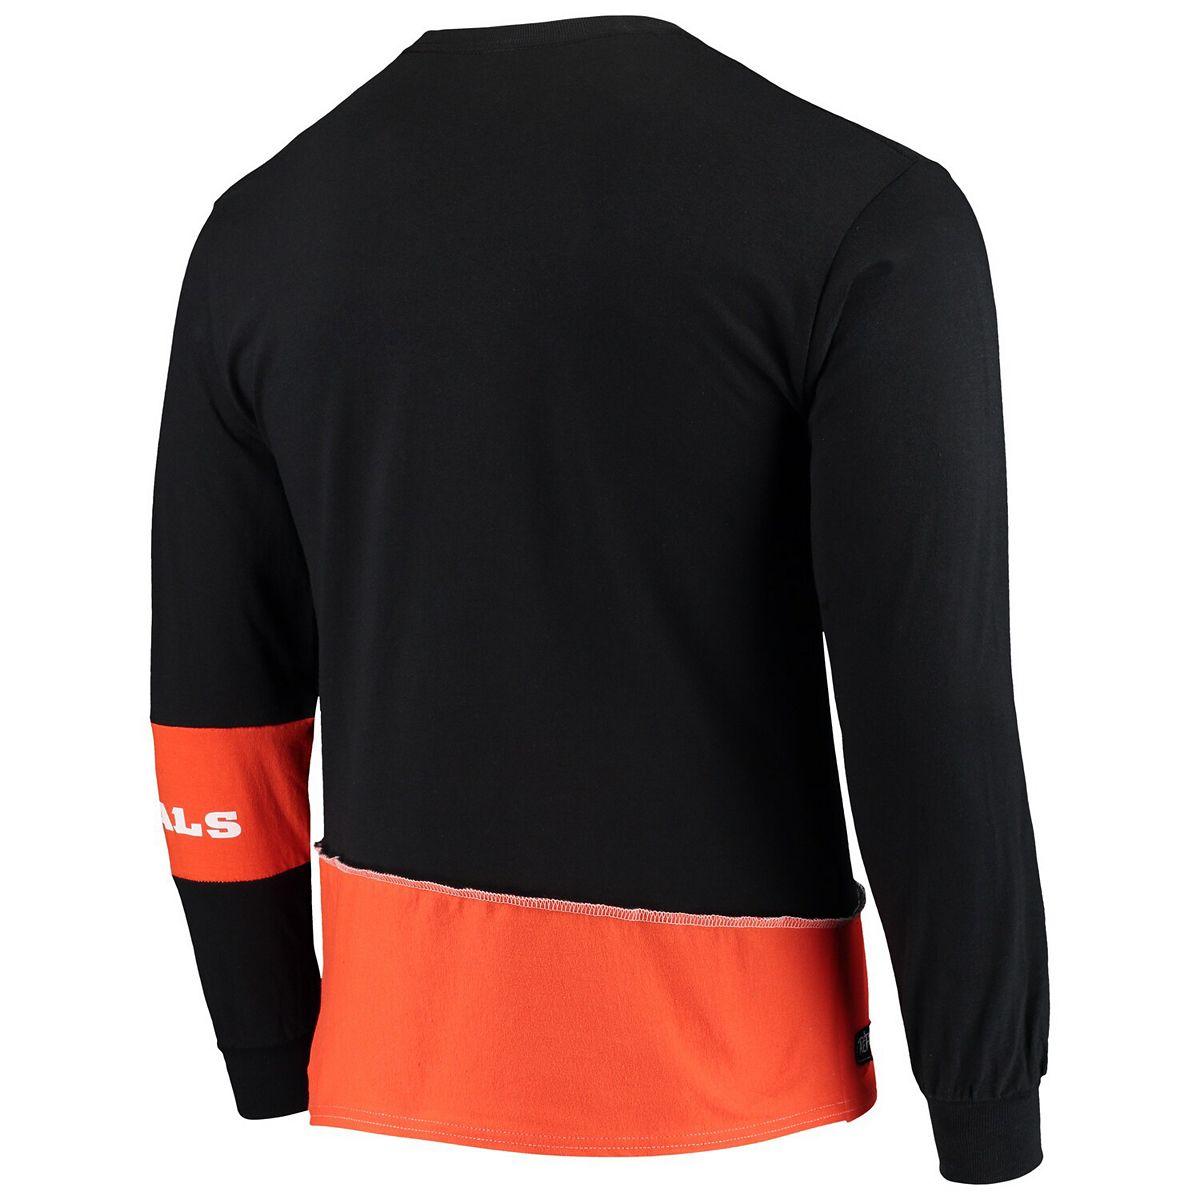 Men's Refried Apparel Black/Orange Cincinnati Bengals Upcycled Angle Long Sleeve T-Shirt nhNJj